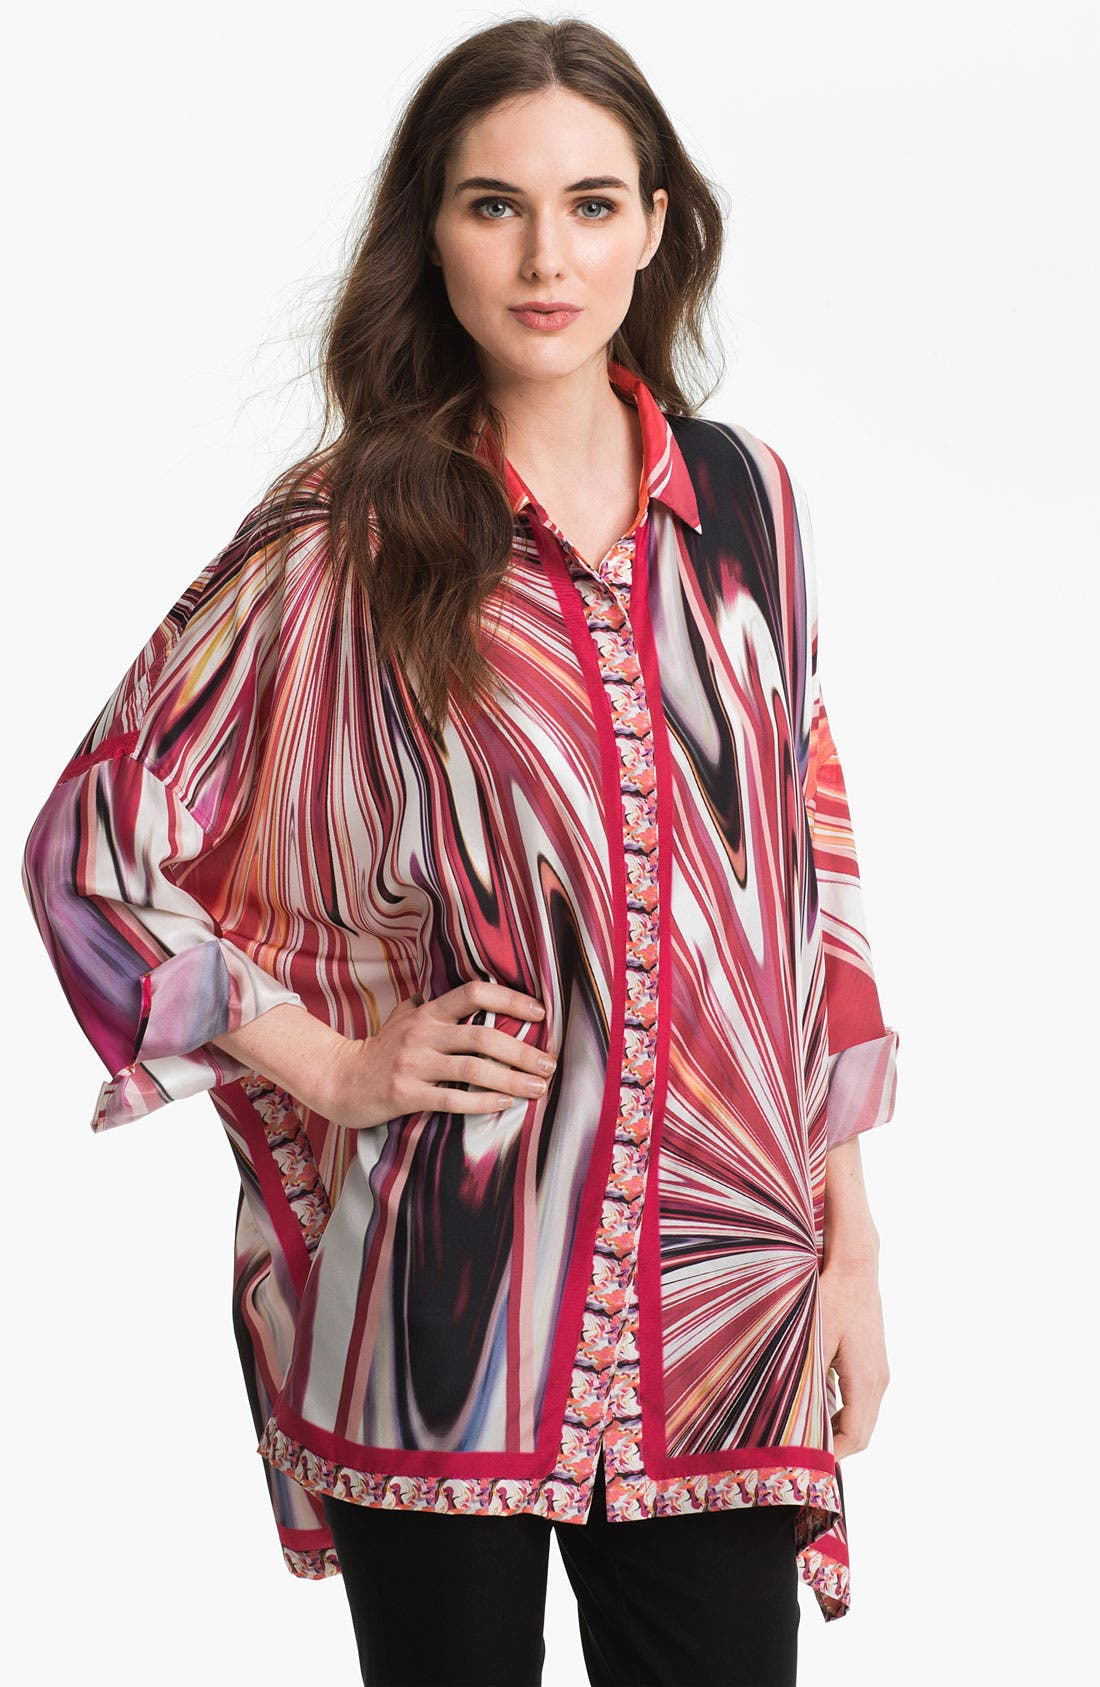 Alternate Image 1 Selected - Lafayette 148 New York 'Nylah' Silk Blouse